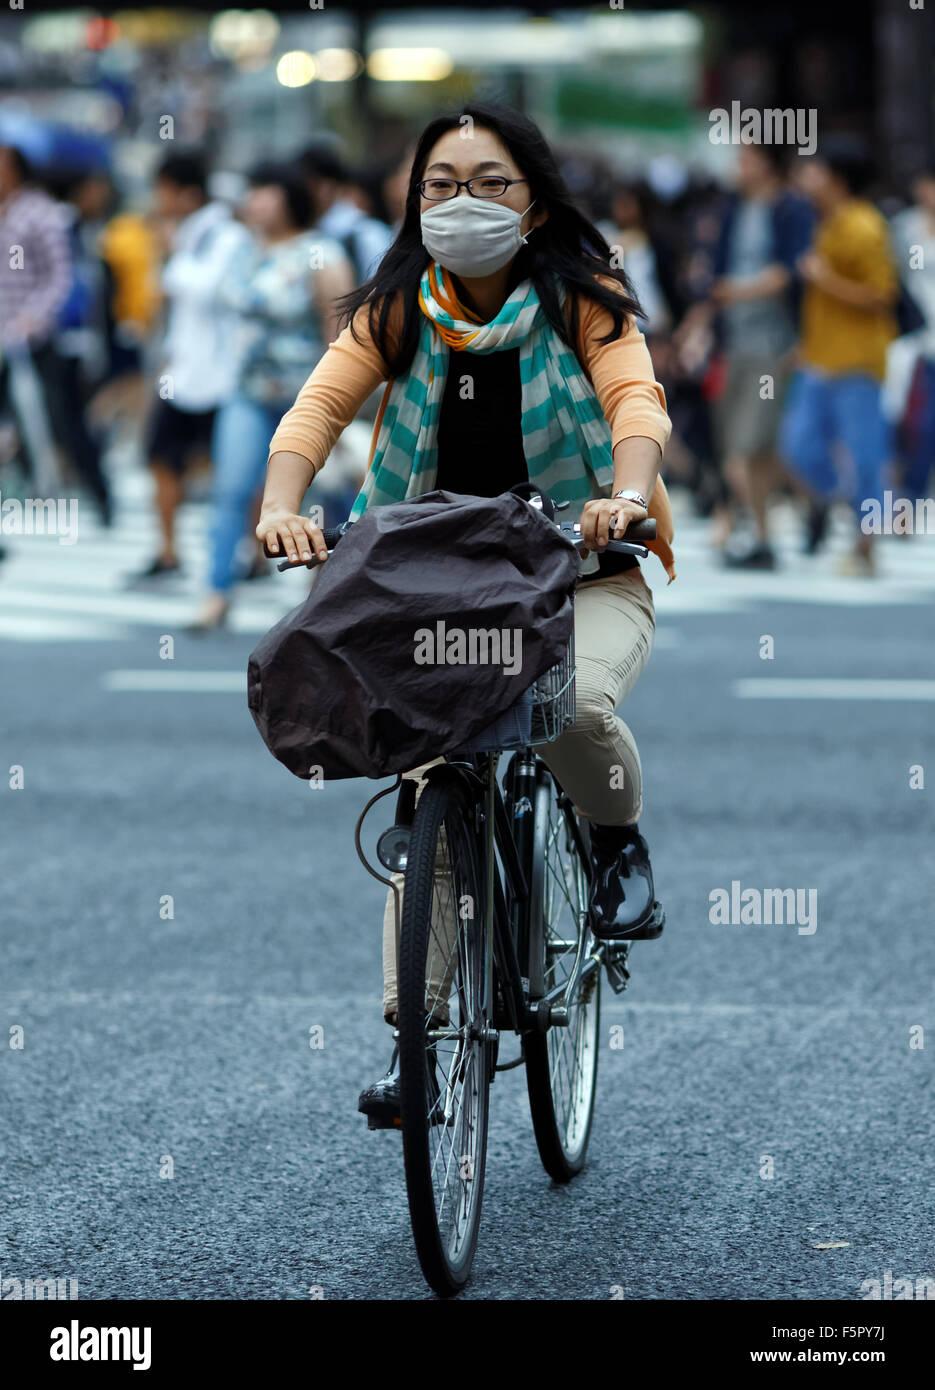 japanese-woman-wearing-face-mask-F5PY7J.